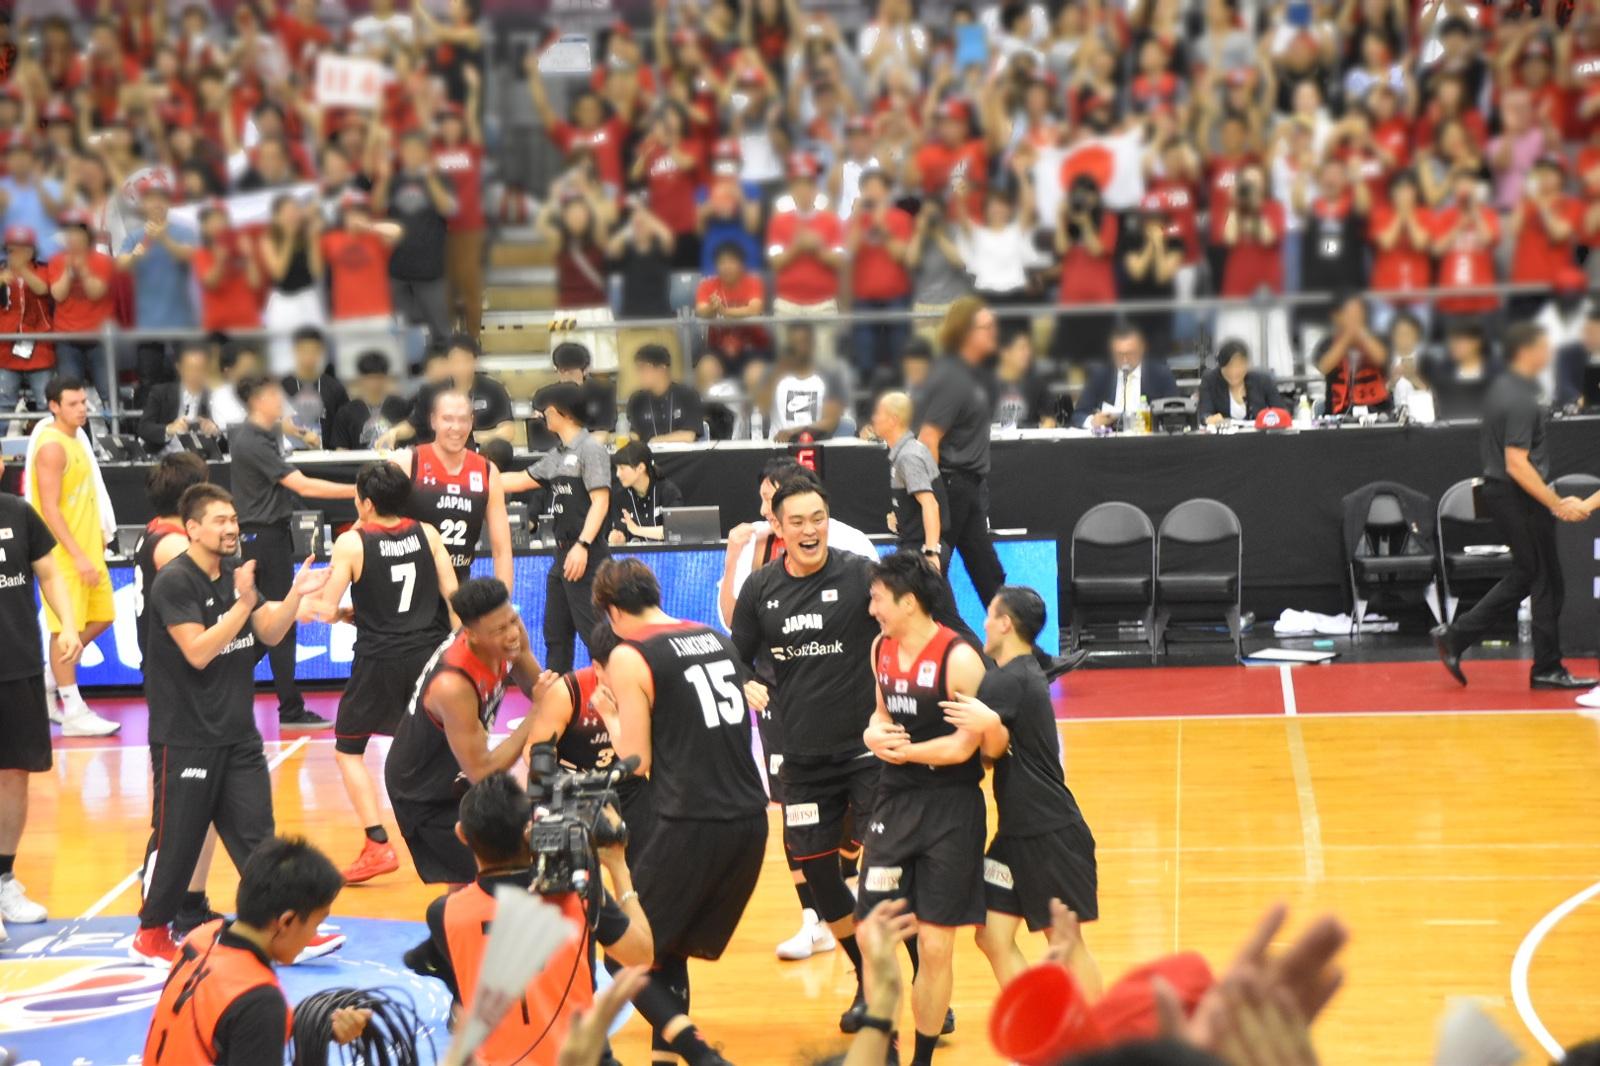 FIBAワールドカップ2019アジア・オセアニア地区1次予選